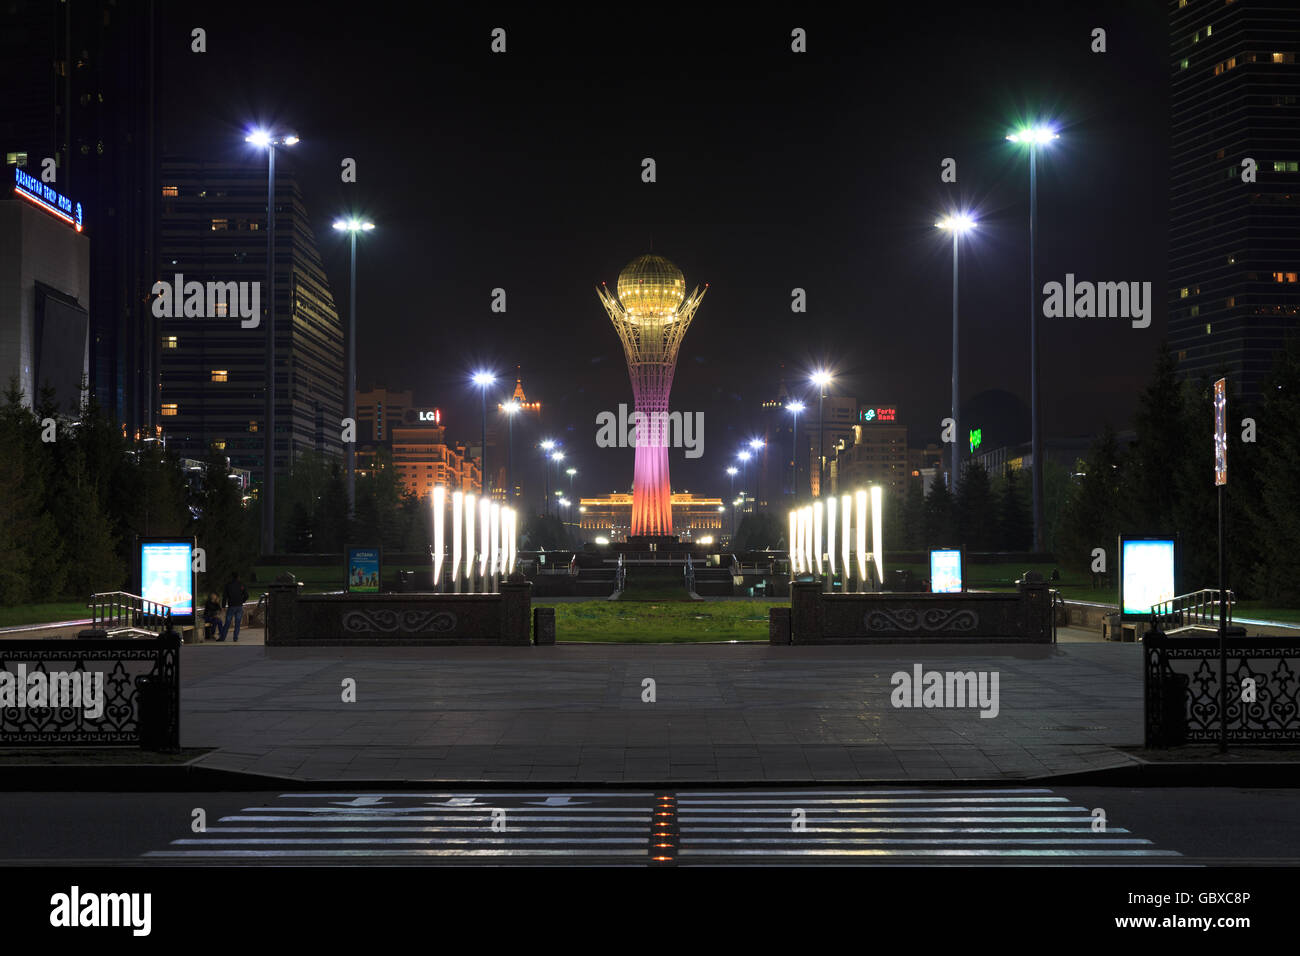 bayterek tower landmark kazakhstan stockfotos bayterek. Black Bedroom Furniture Sets. Home Design Ideas